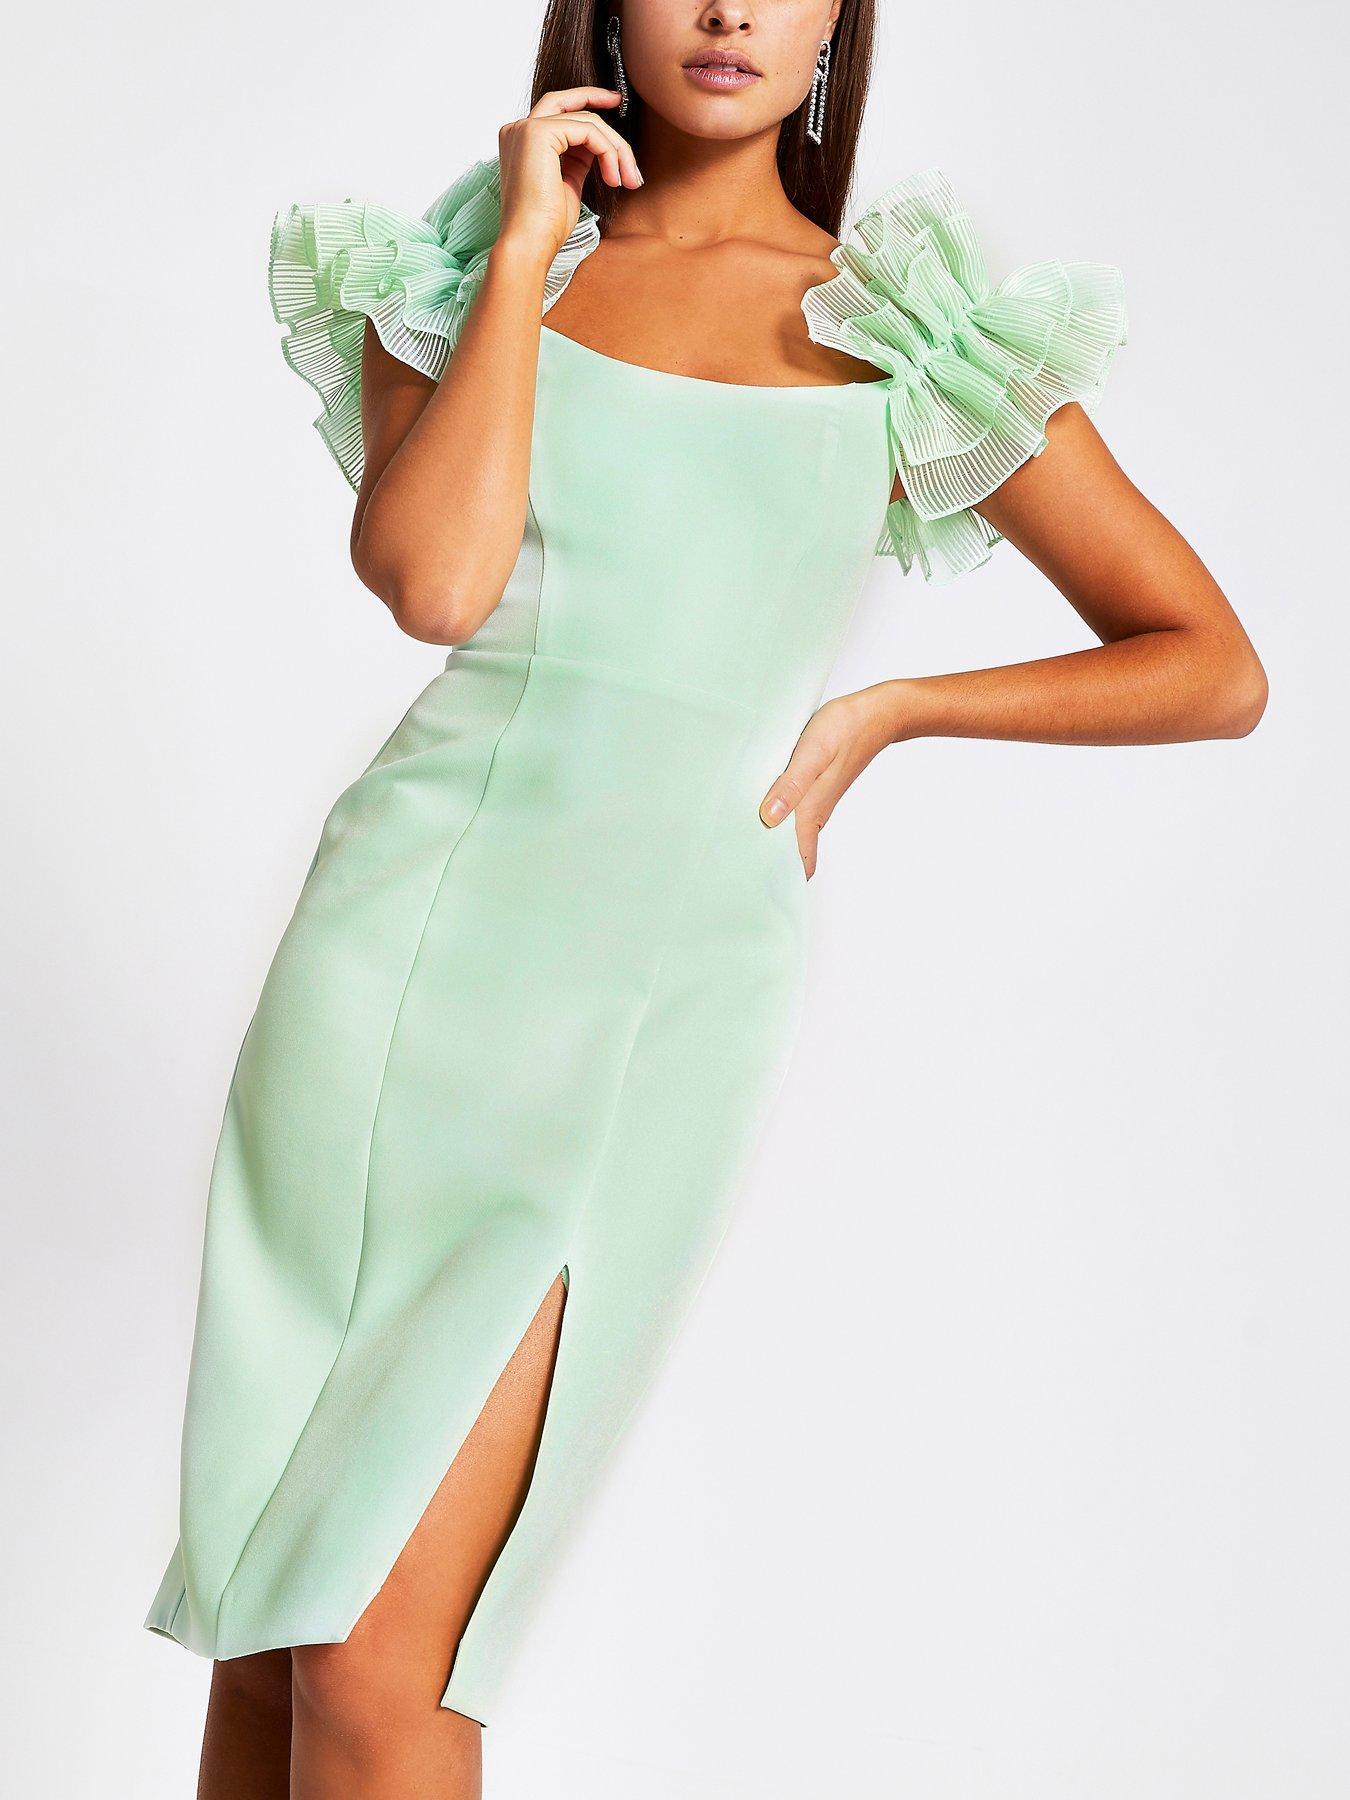 Tinkerbell Green Disney 2 Piece Thermal Underwear Set Girls Size 6 NIP